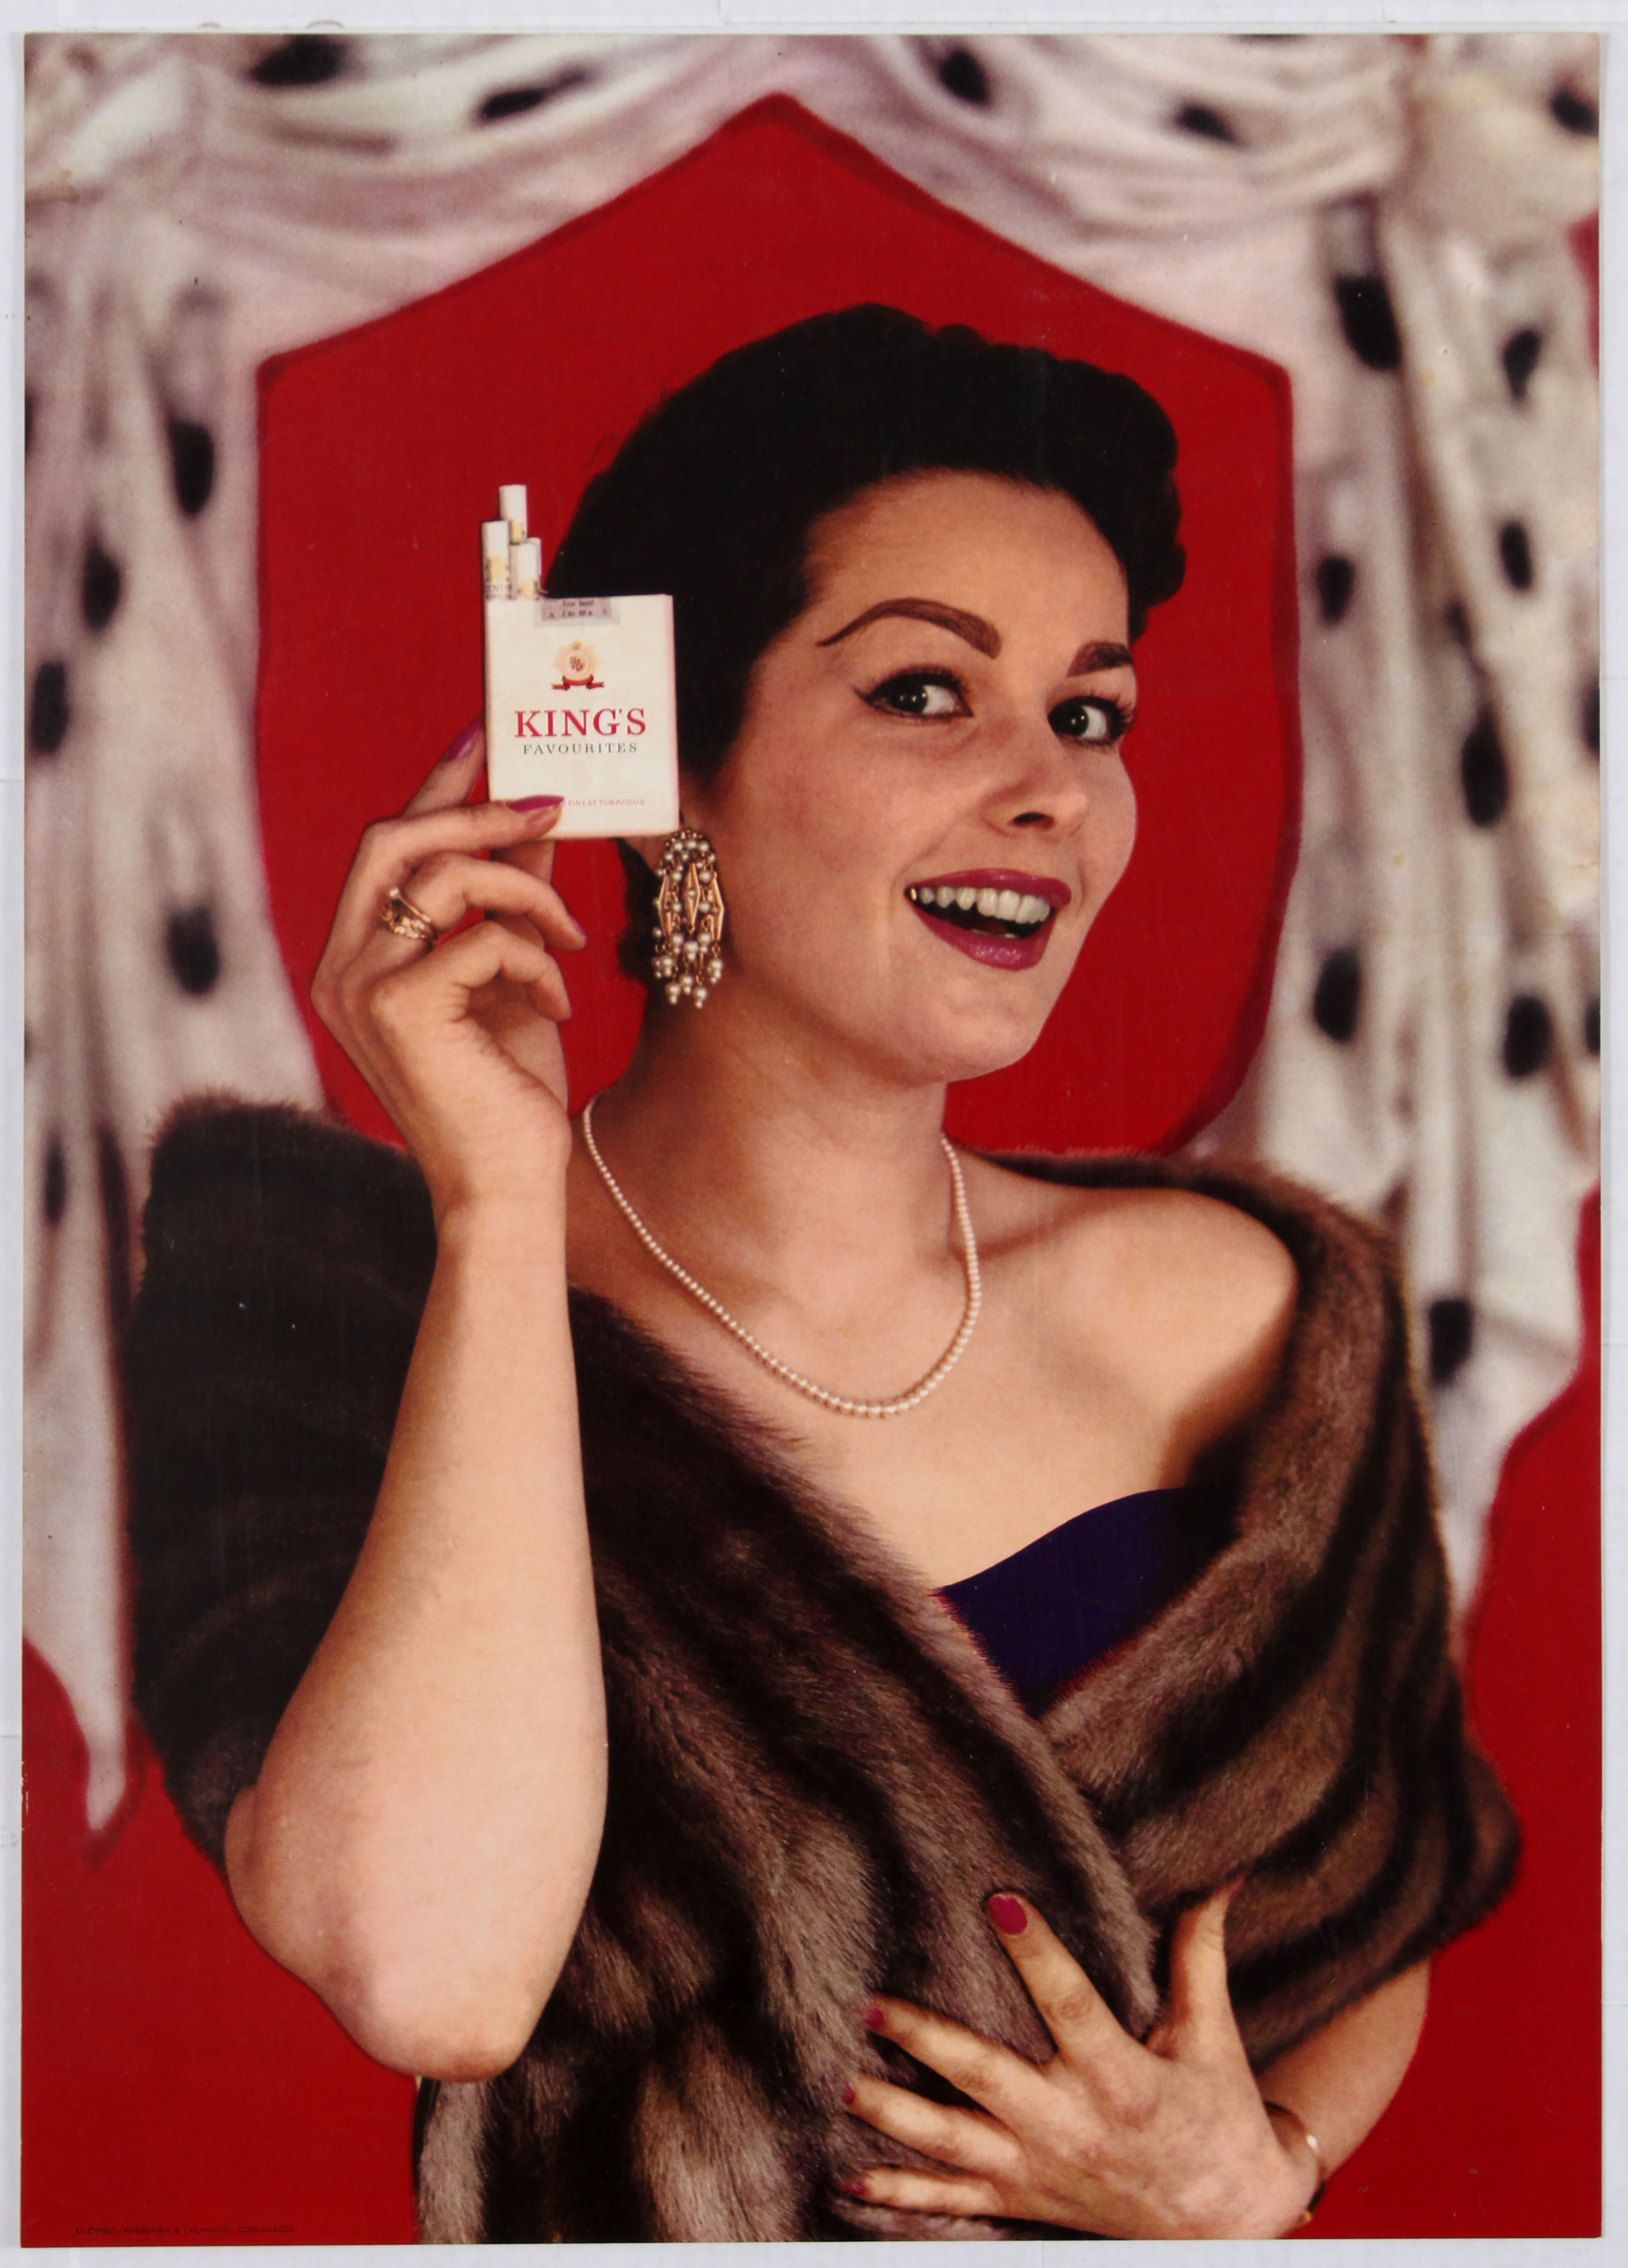 Lot 1602 - Advertising Poster King's Cigarettes Advertising